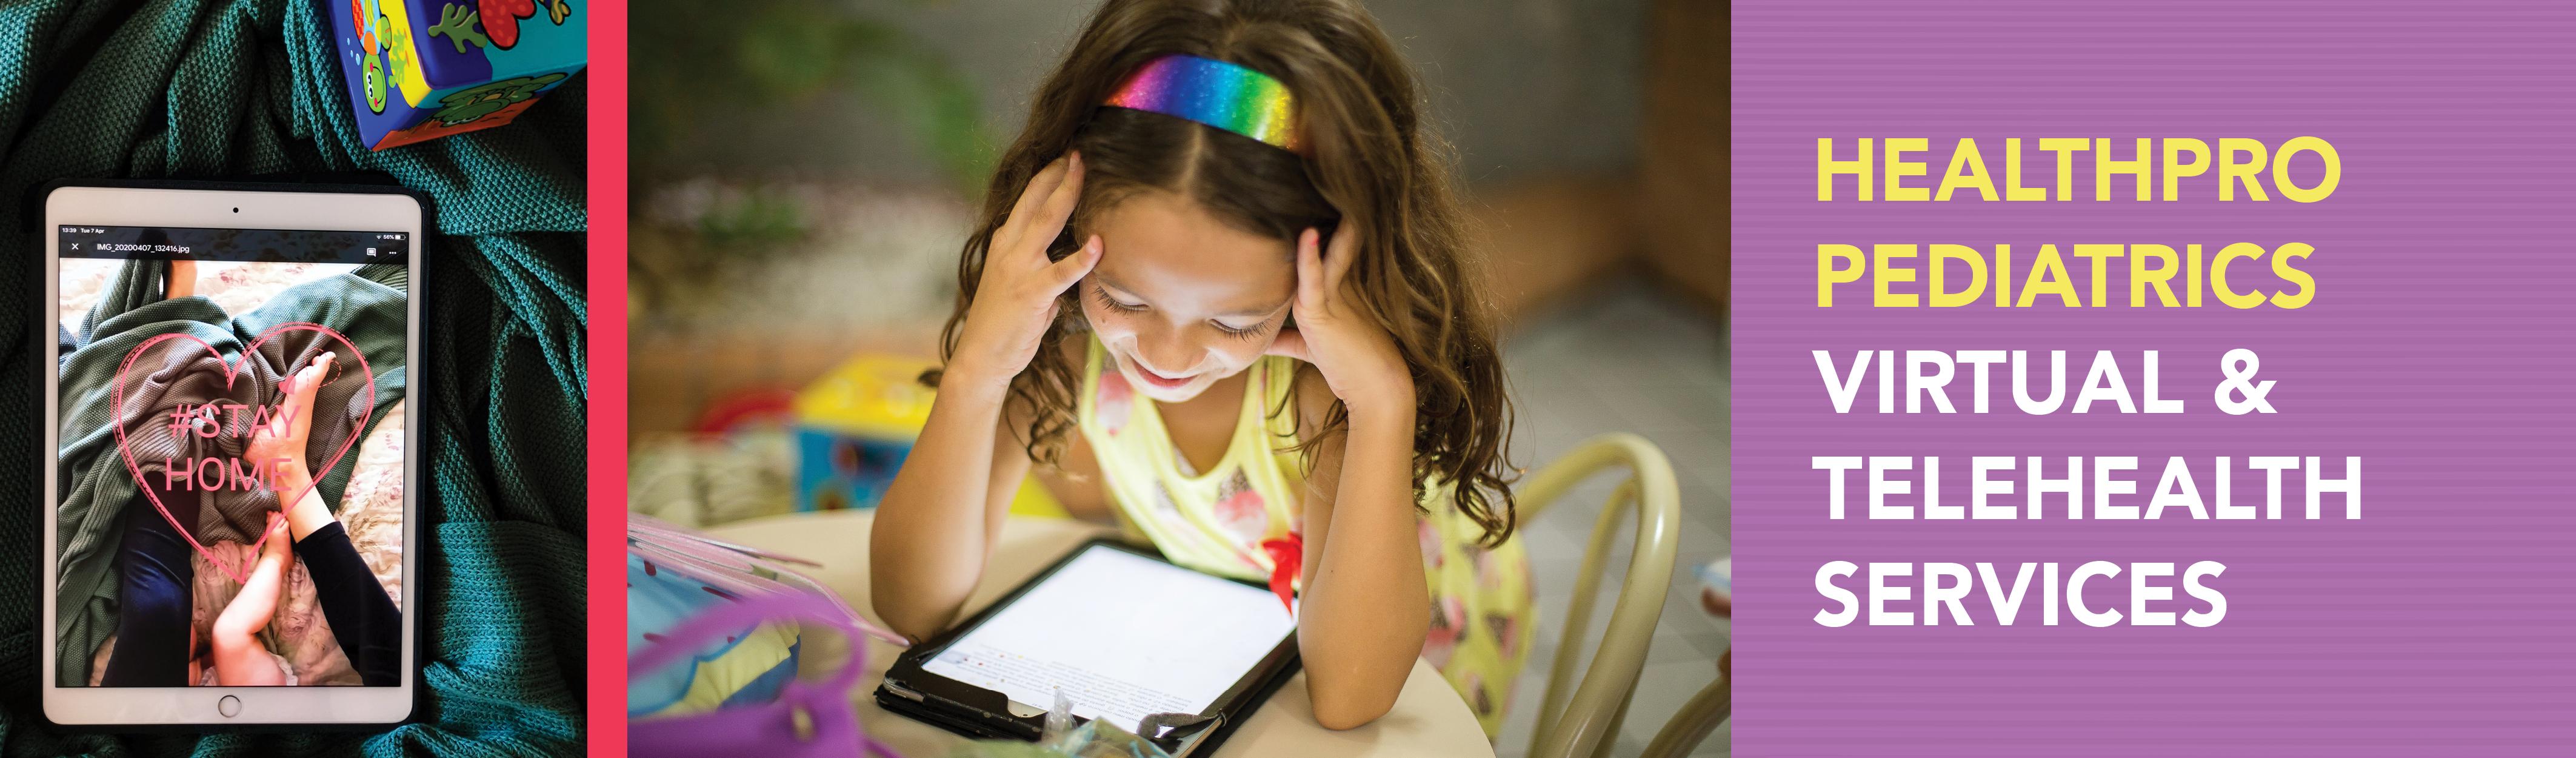 HealthPRO Pediatrics Virtual & Telehealth Services